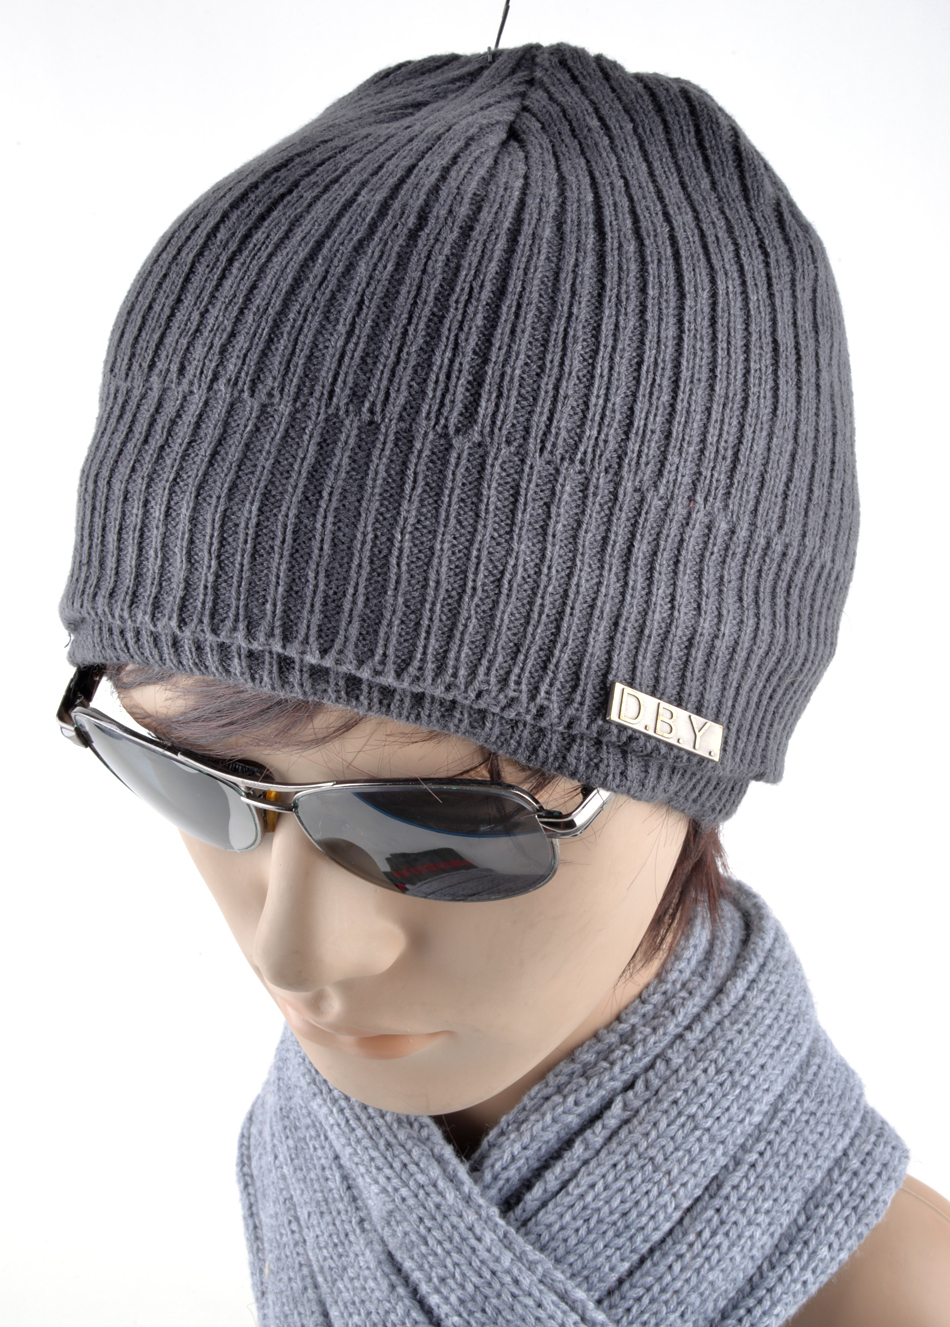 Oenbopo Baby Winter Warm Knit Hat Infant Toddler Kid Crochet Hairball Beanie. PanDaDa Baby Girls Boys Hats Winter Warm Cap Hat Beanie Pilot Aviator Crochet Earflap. by PanDaDa. $ - $ $ 6 $ 9 99 Prime. FREE Shipping on eligible orders. Shopbop Designer Fashion Brands.